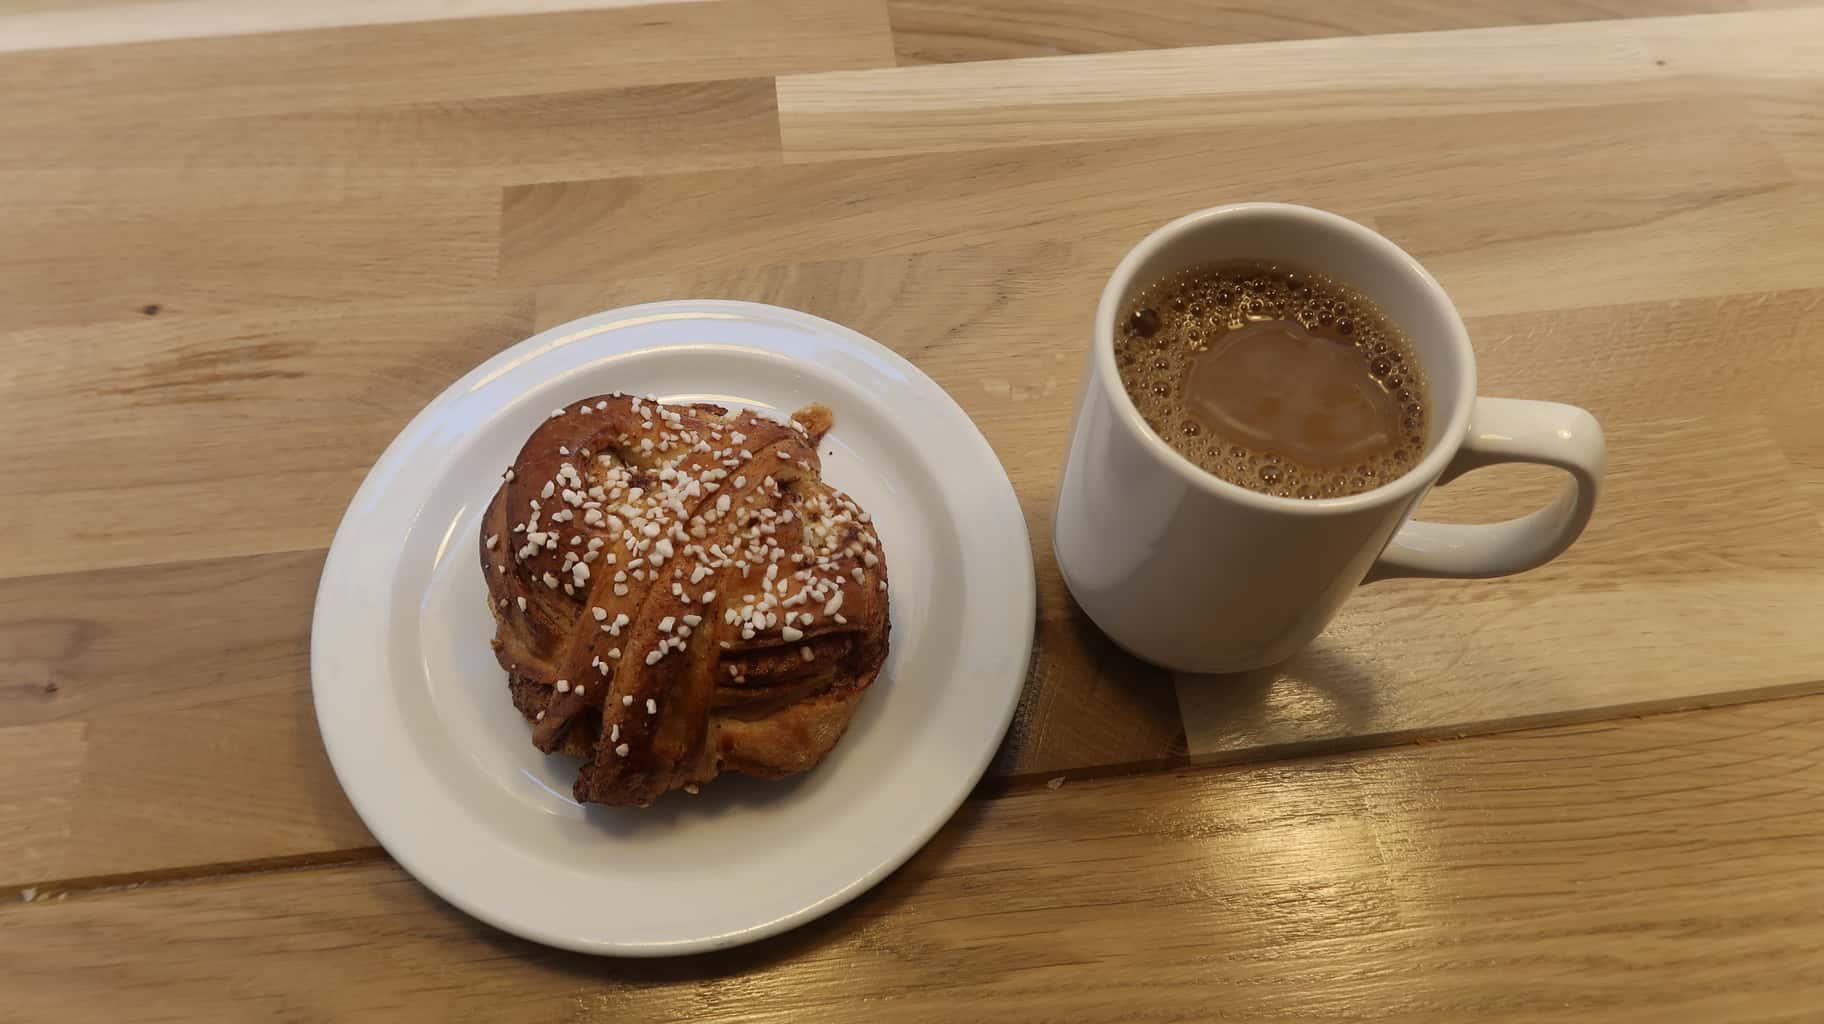 Kaffe med kanelbulle